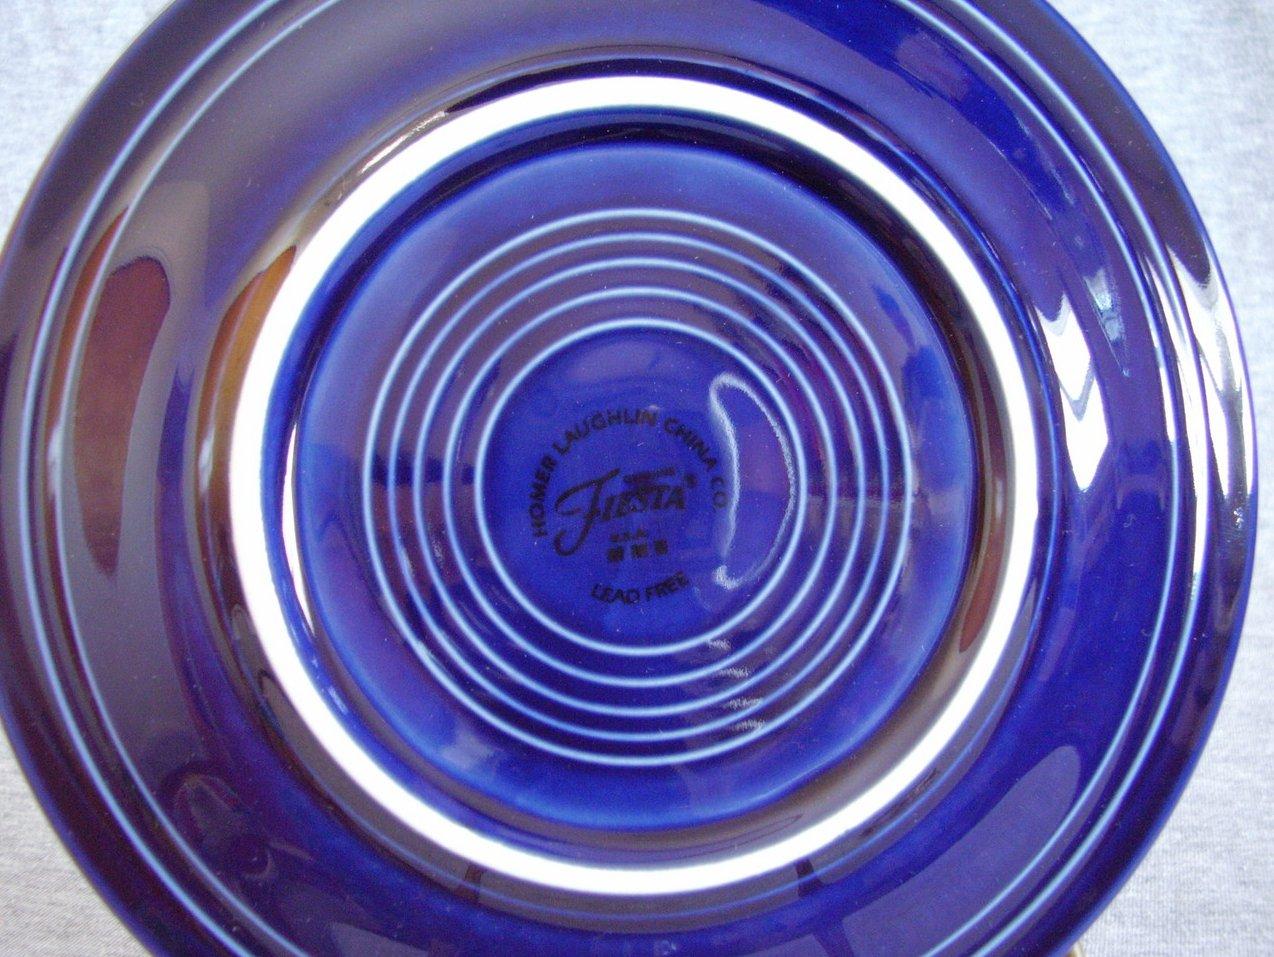 Fiestaware Cobalt 5pc Placeset